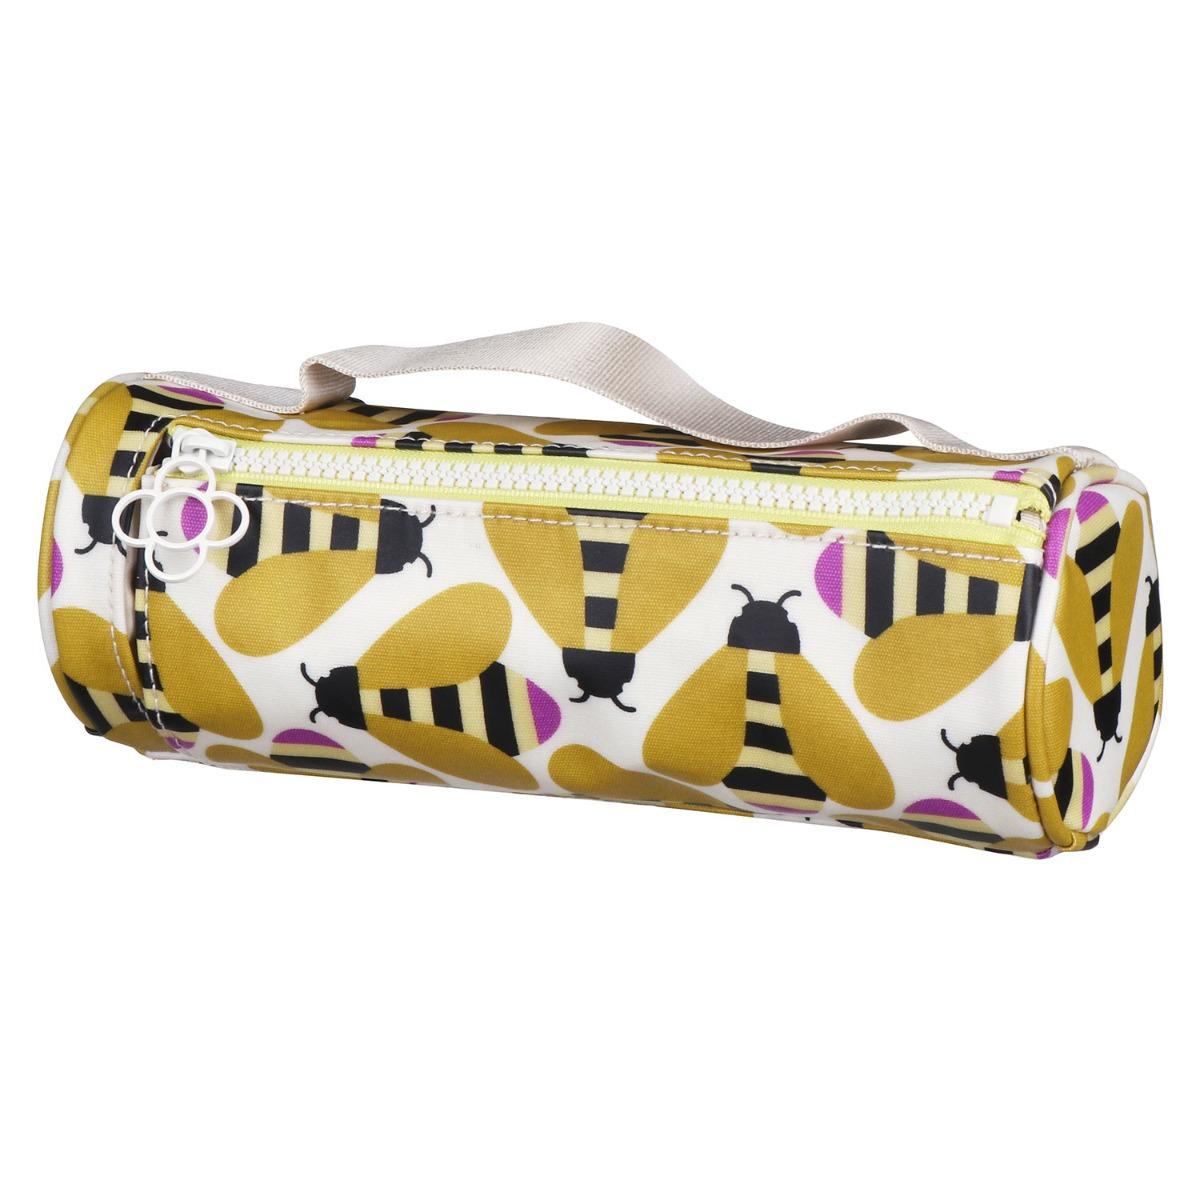 Orla Kiely Busy Bee Brush & Pencil Case Cosmetic Bag